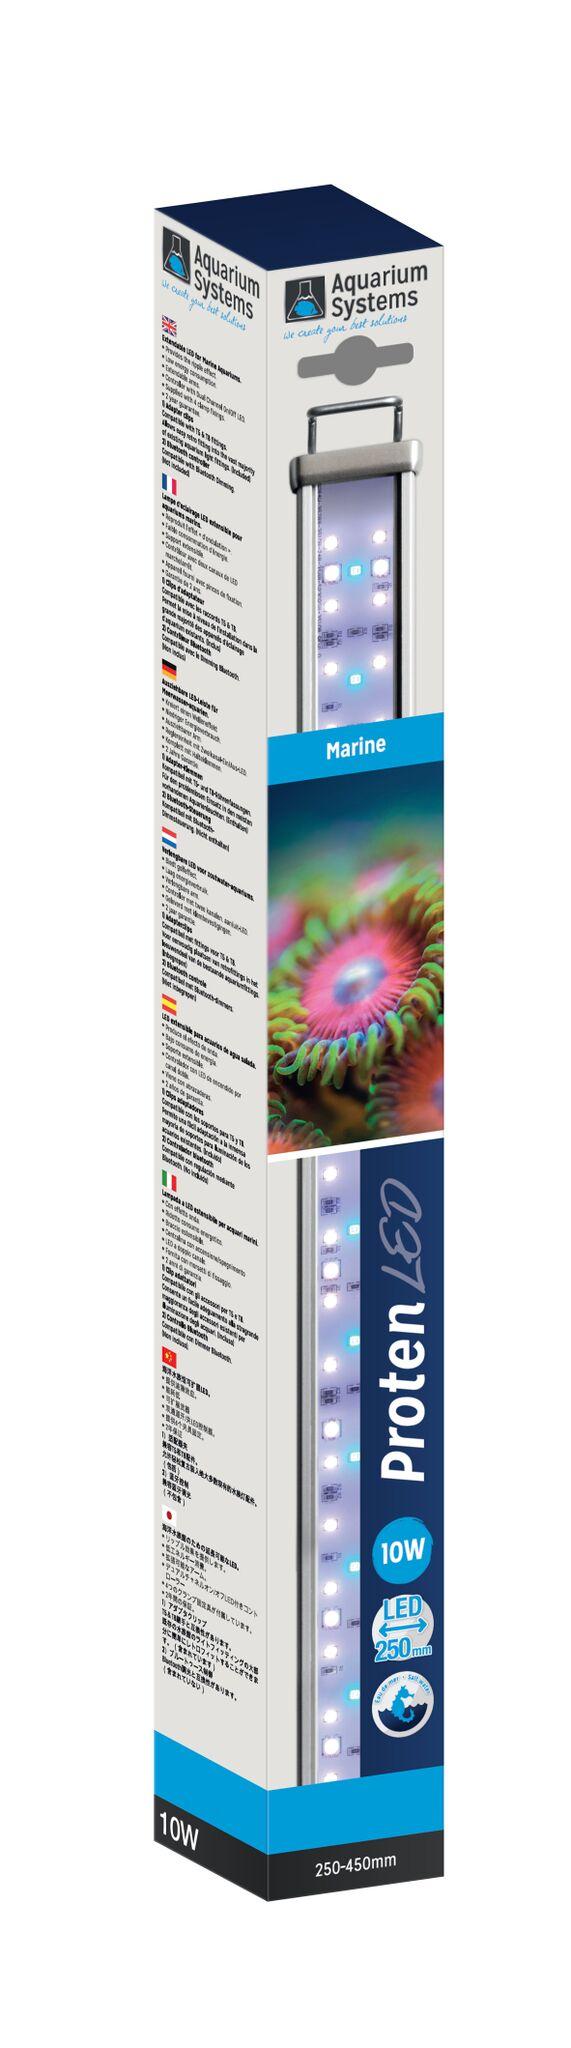 Aquarium Systems Proten LED bar marine  250 - 450mm 10W